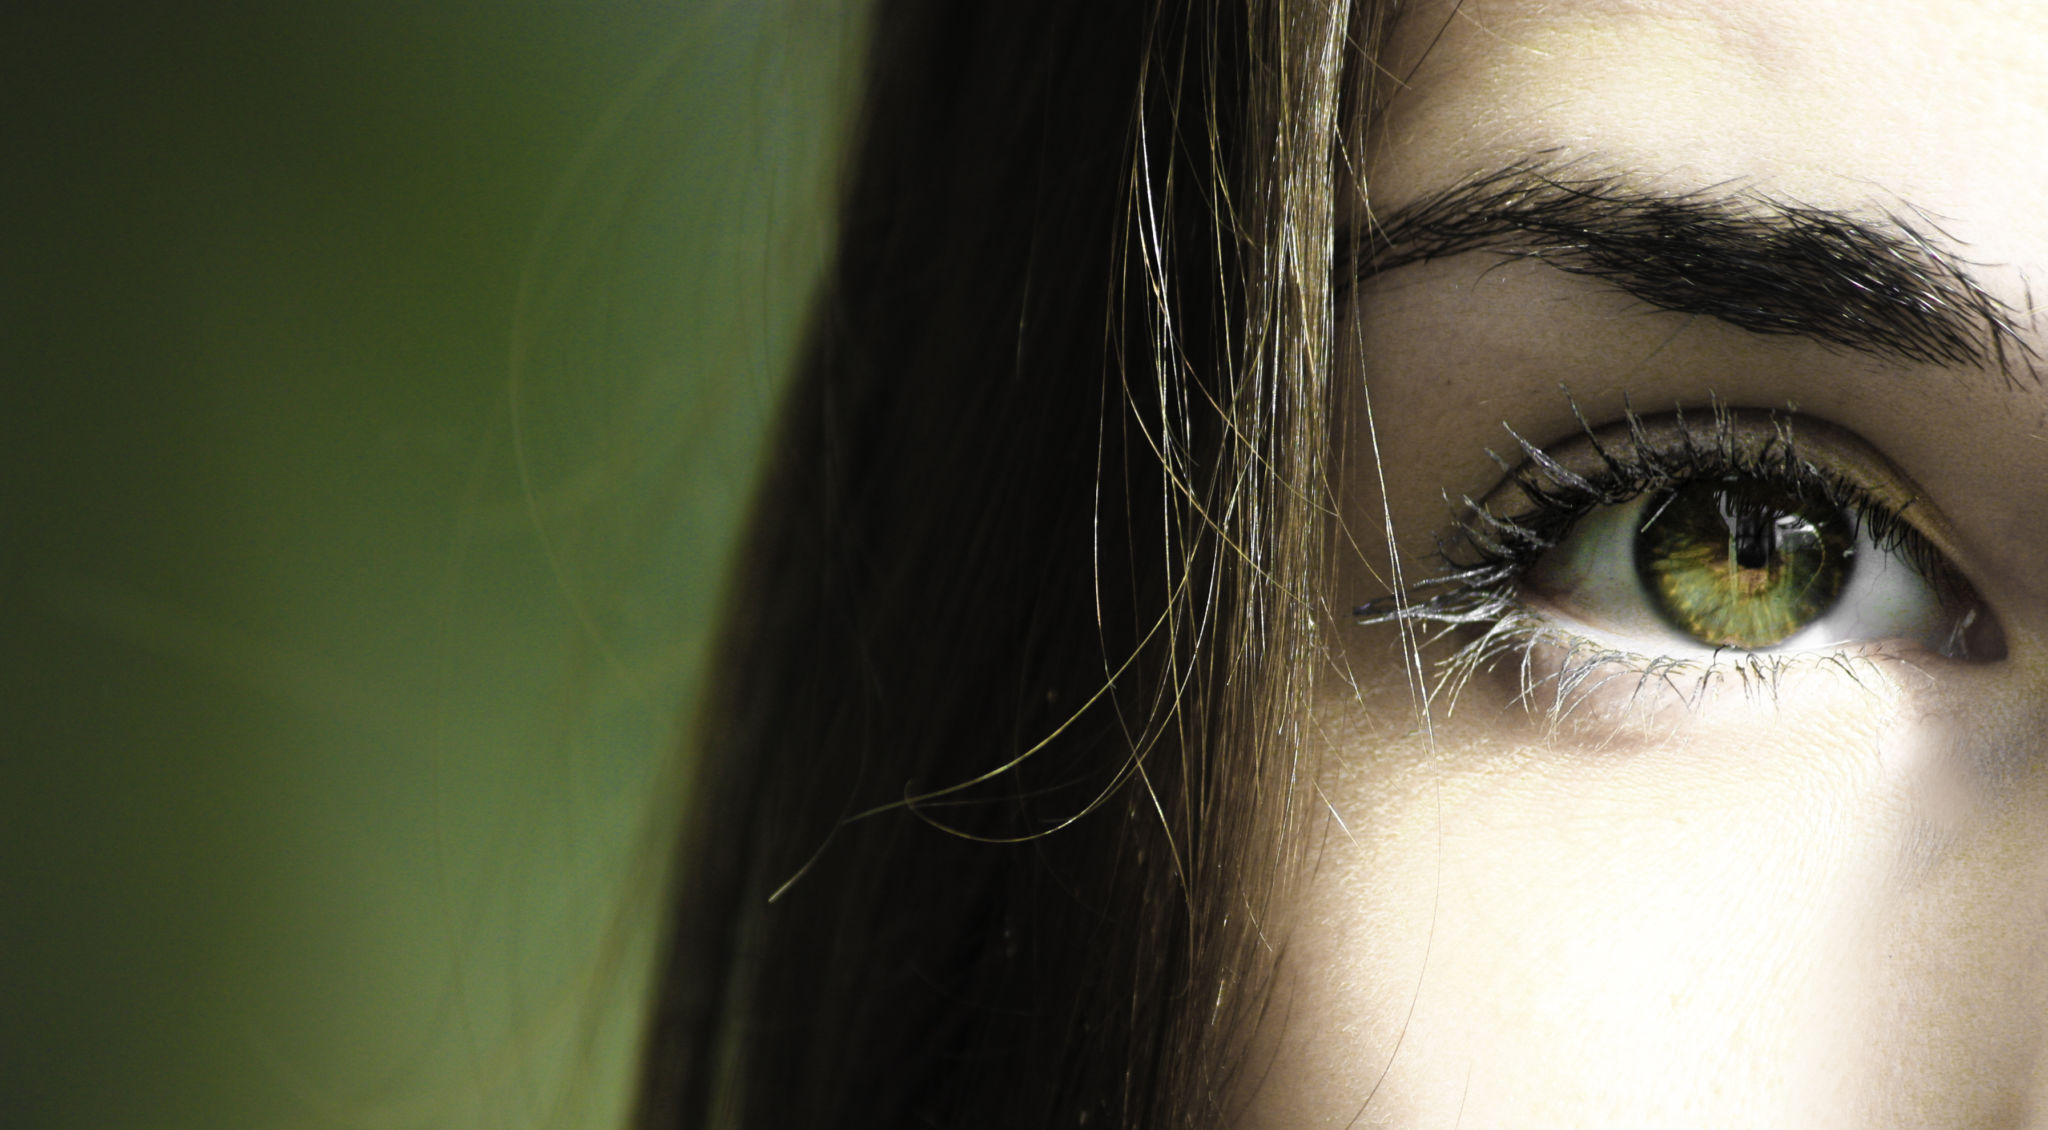 Últimos avances en salud visual - Ophthalteam Ophthalteam